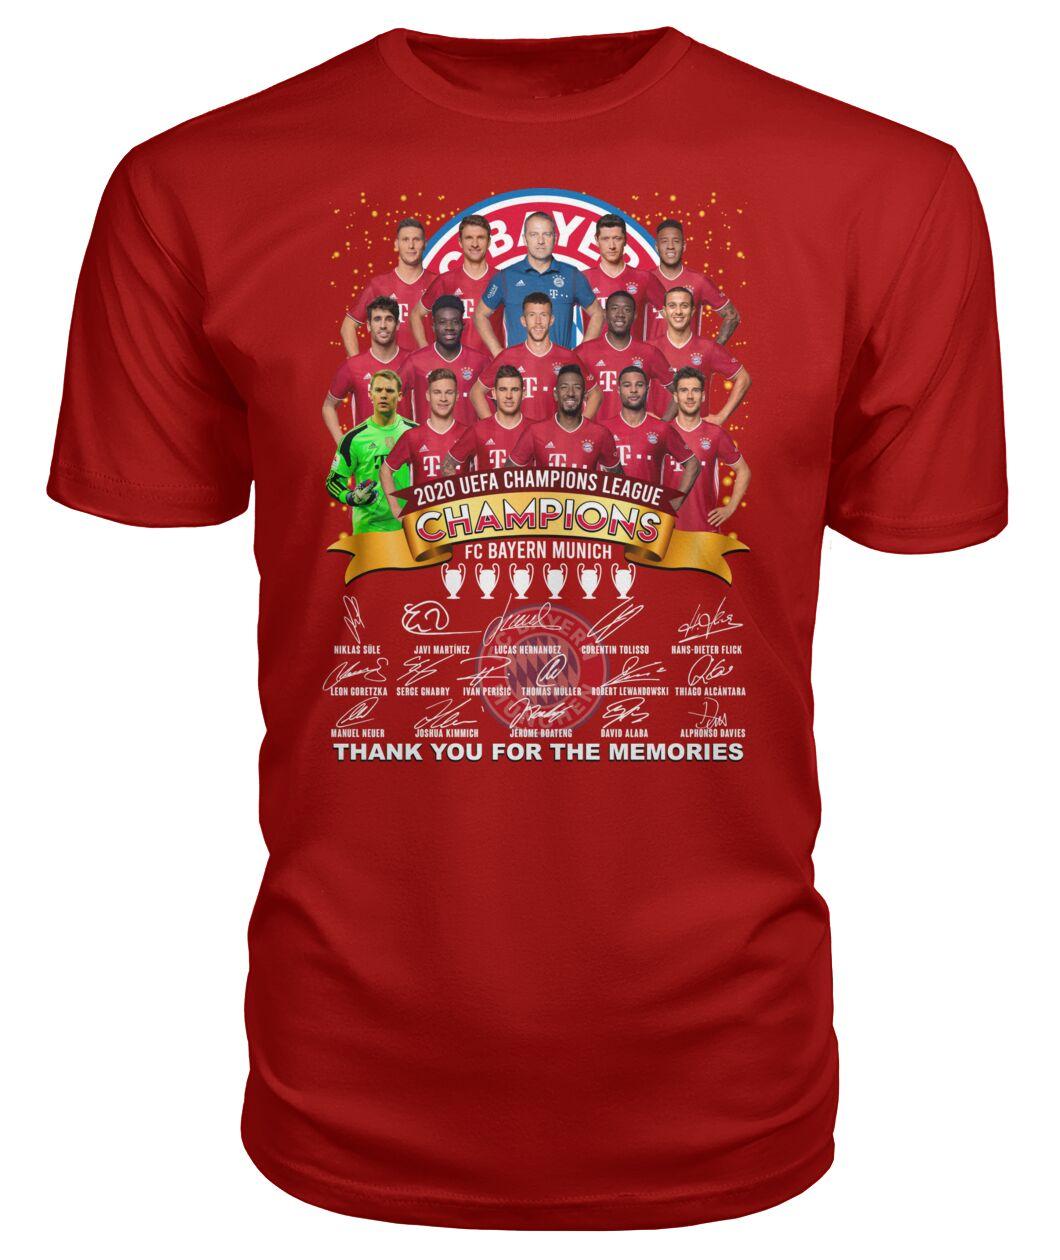 fc bayern munich 2020 uefa champions league thank you for the memories shirt 1